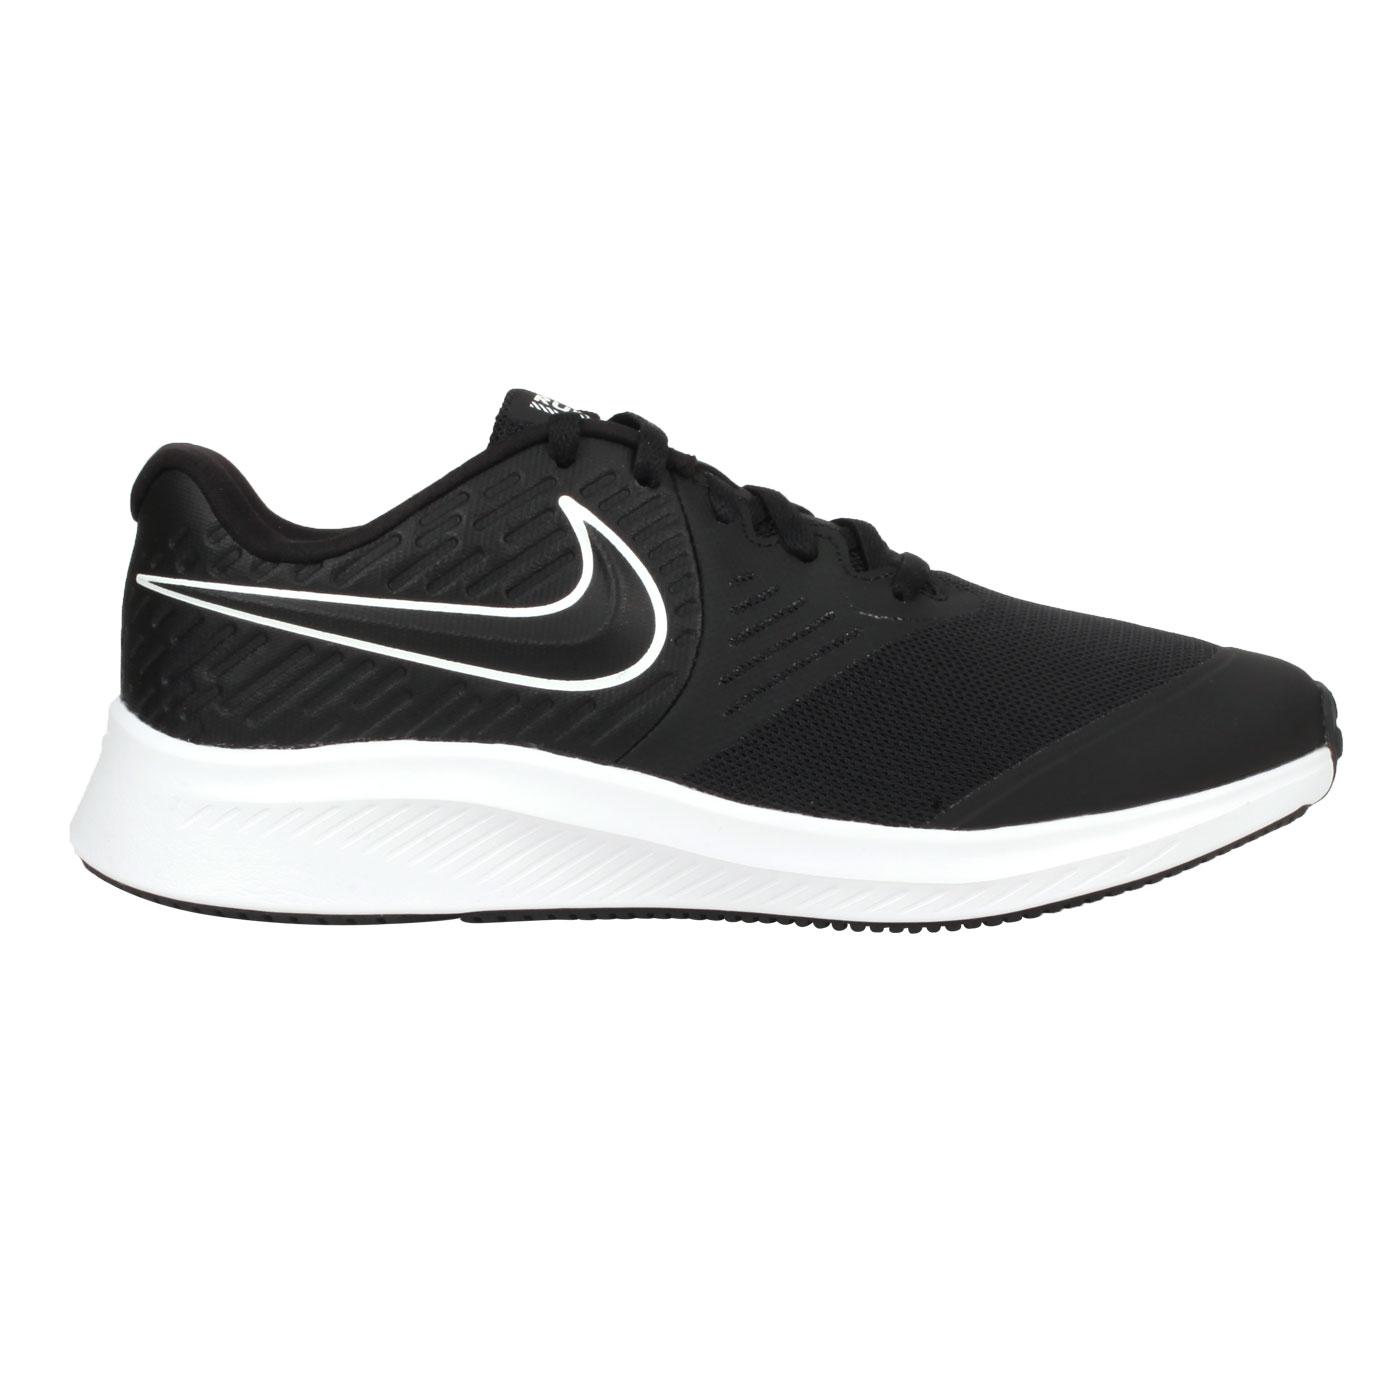 NIKE 大童慢跑鞋  @STAR RUNNER 2 (GS)@AQ3542001 - 黑白